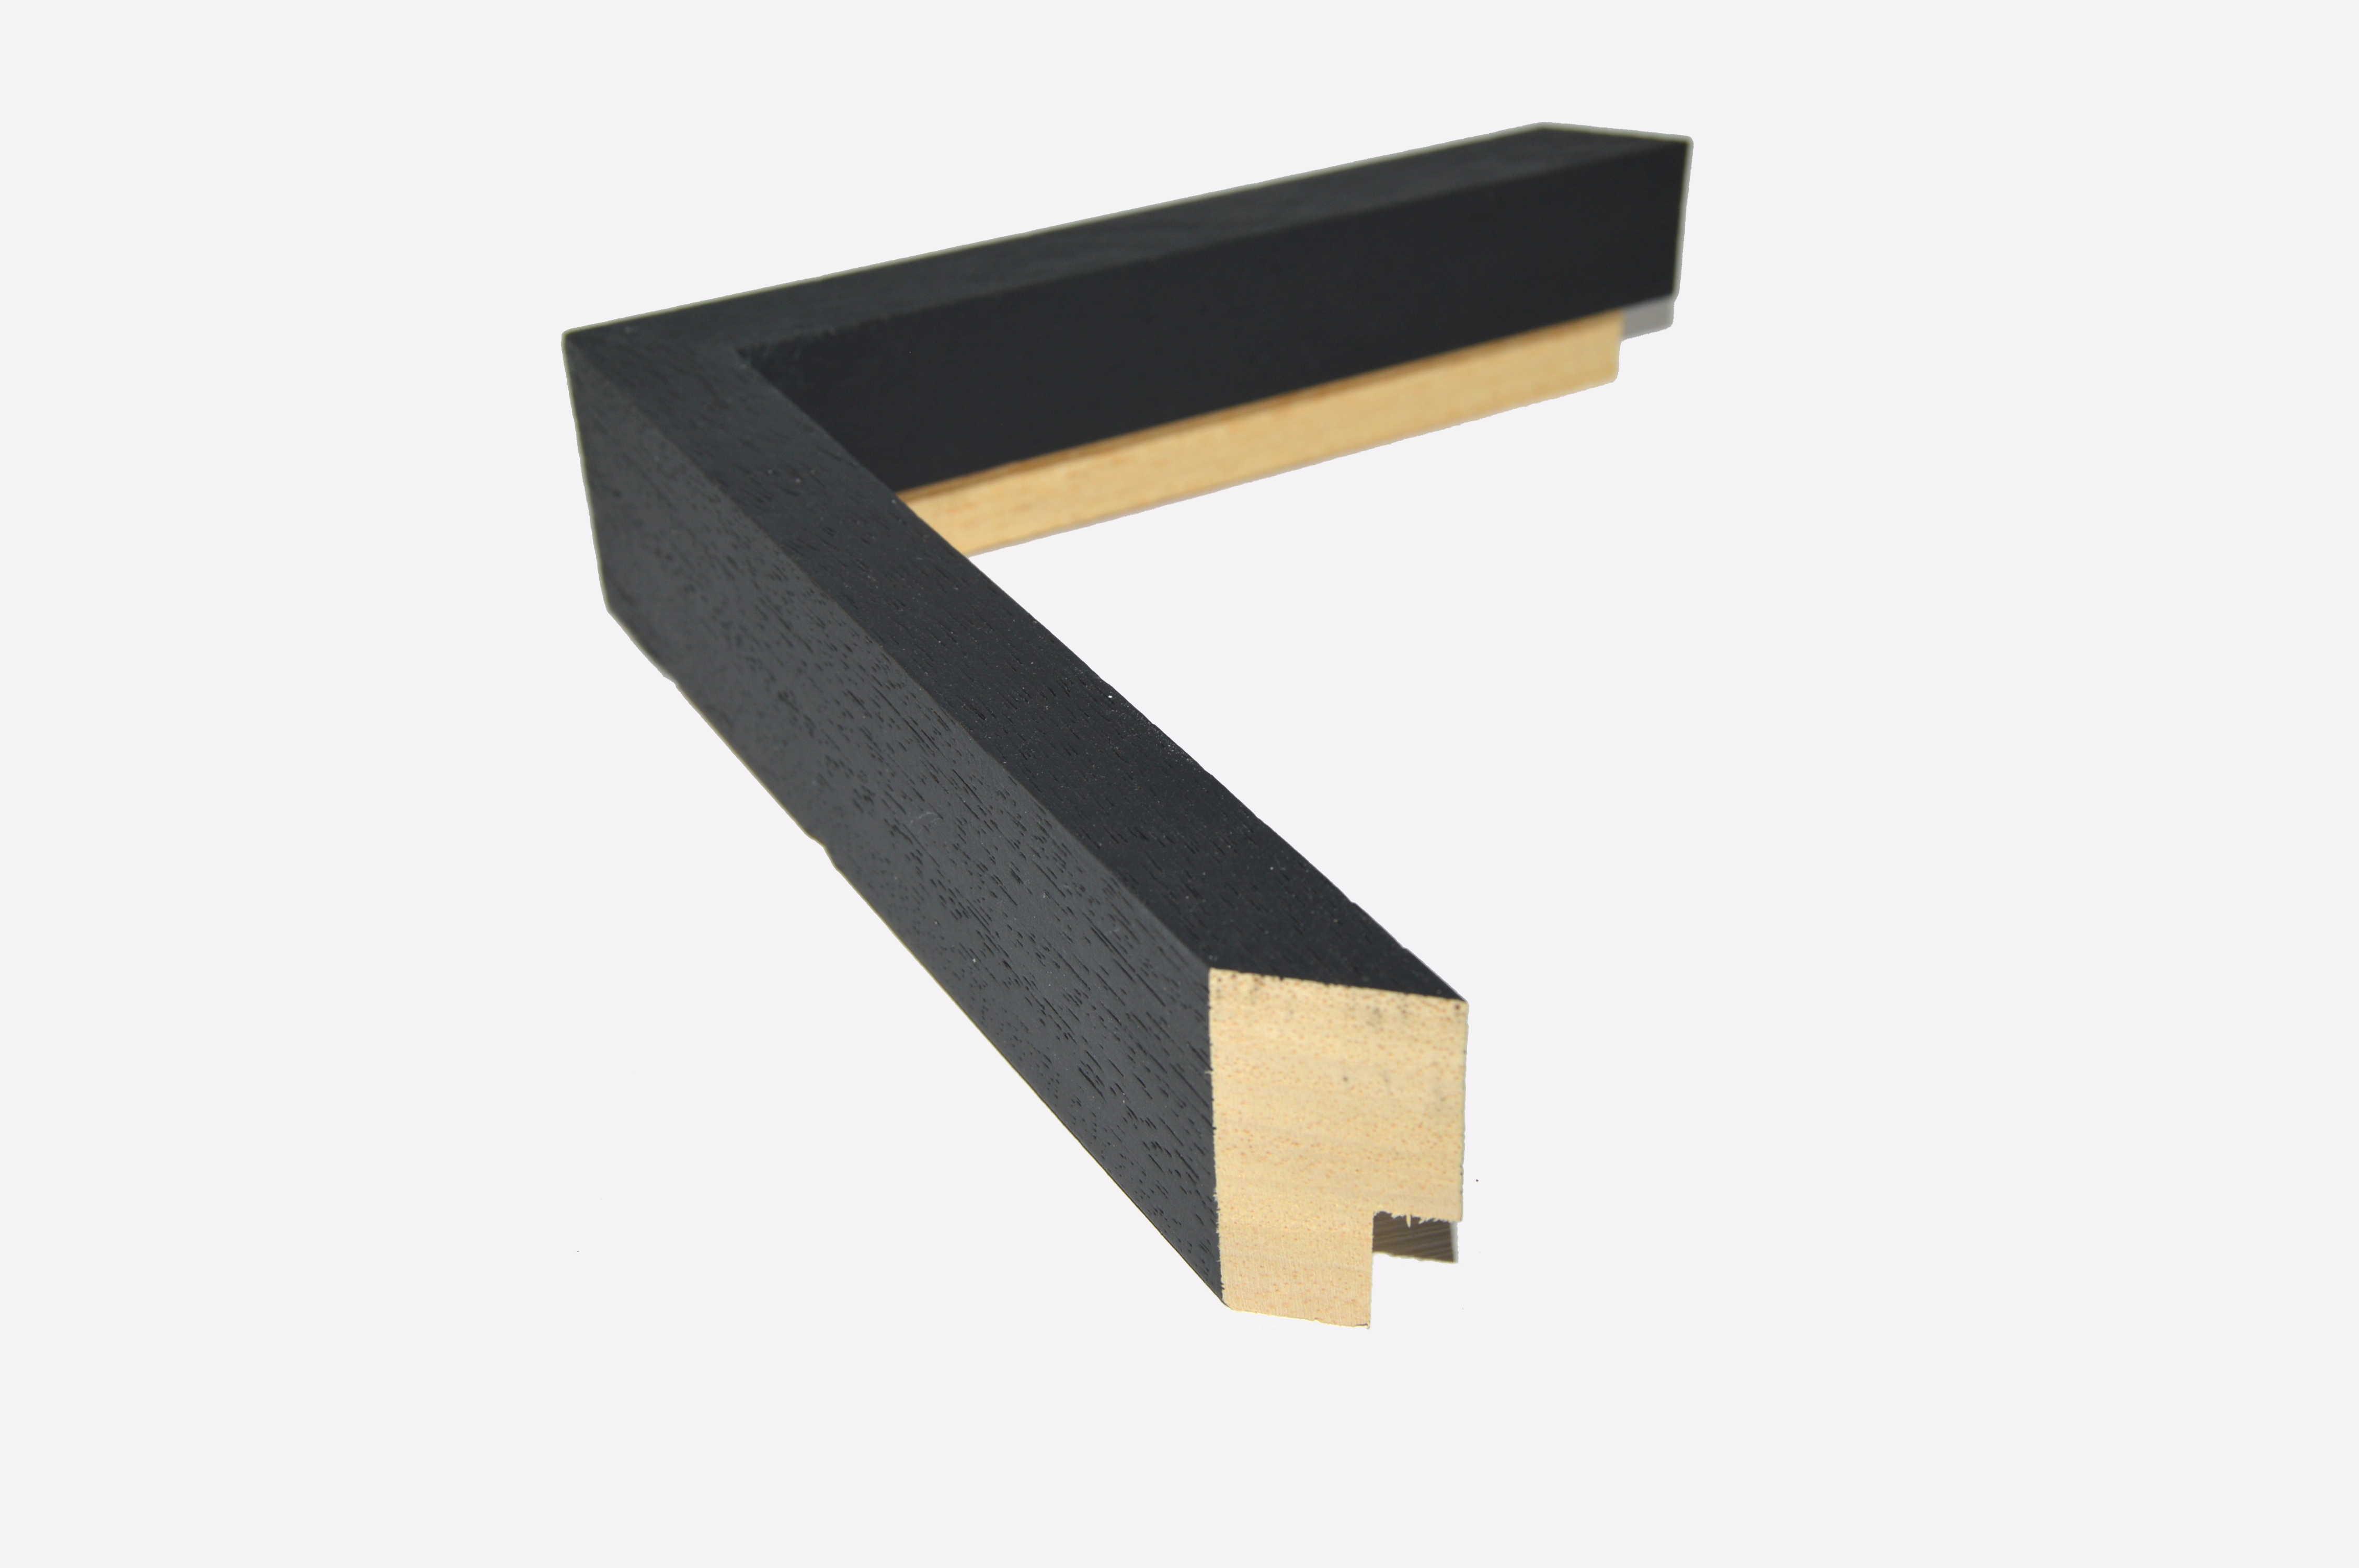 01121-370 PLANA NEGRA-ancho1.7cm-perfil